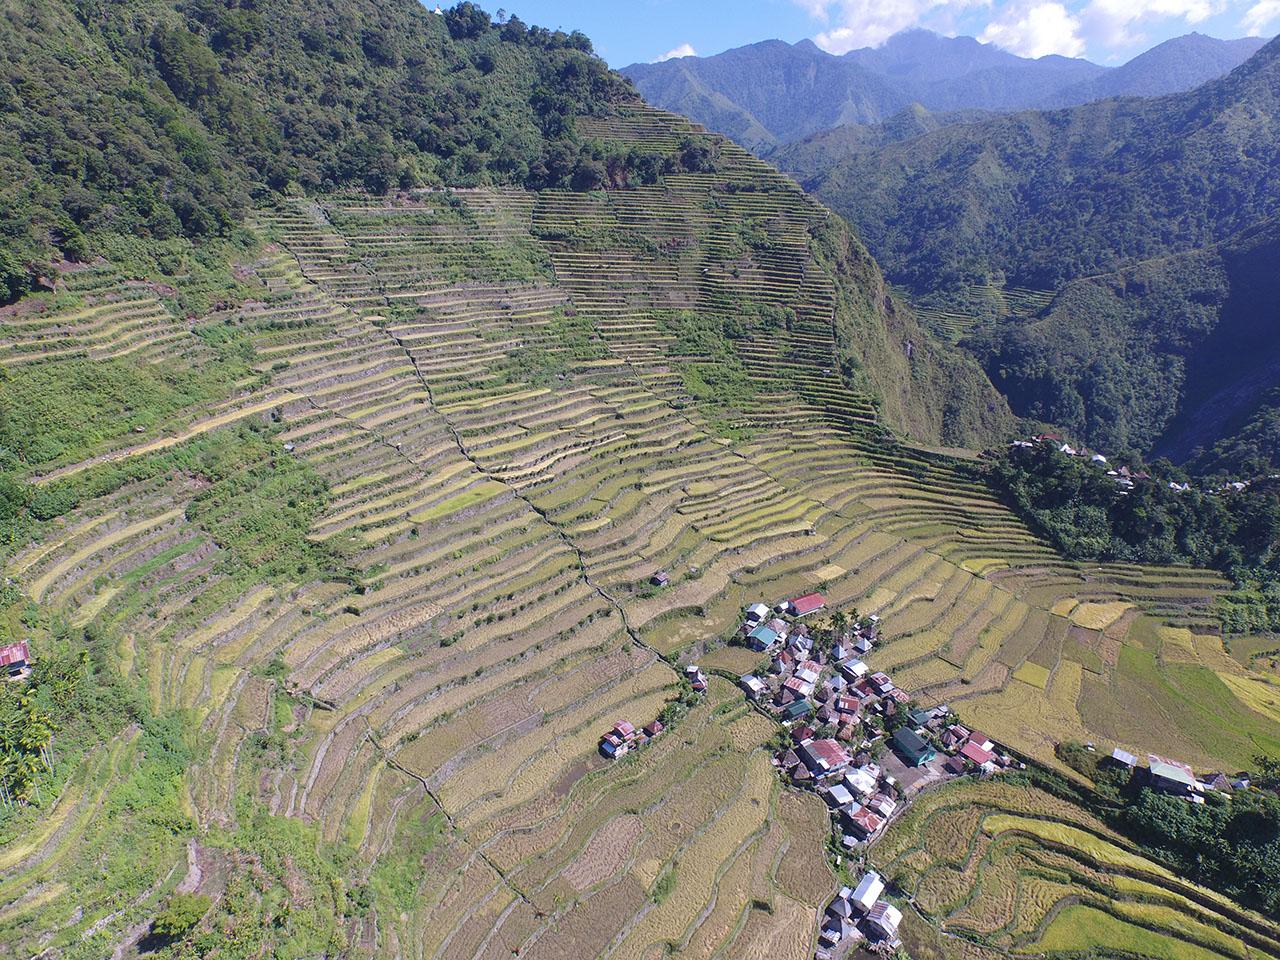 Photo courtesy of the Ifugao Archaeological Project